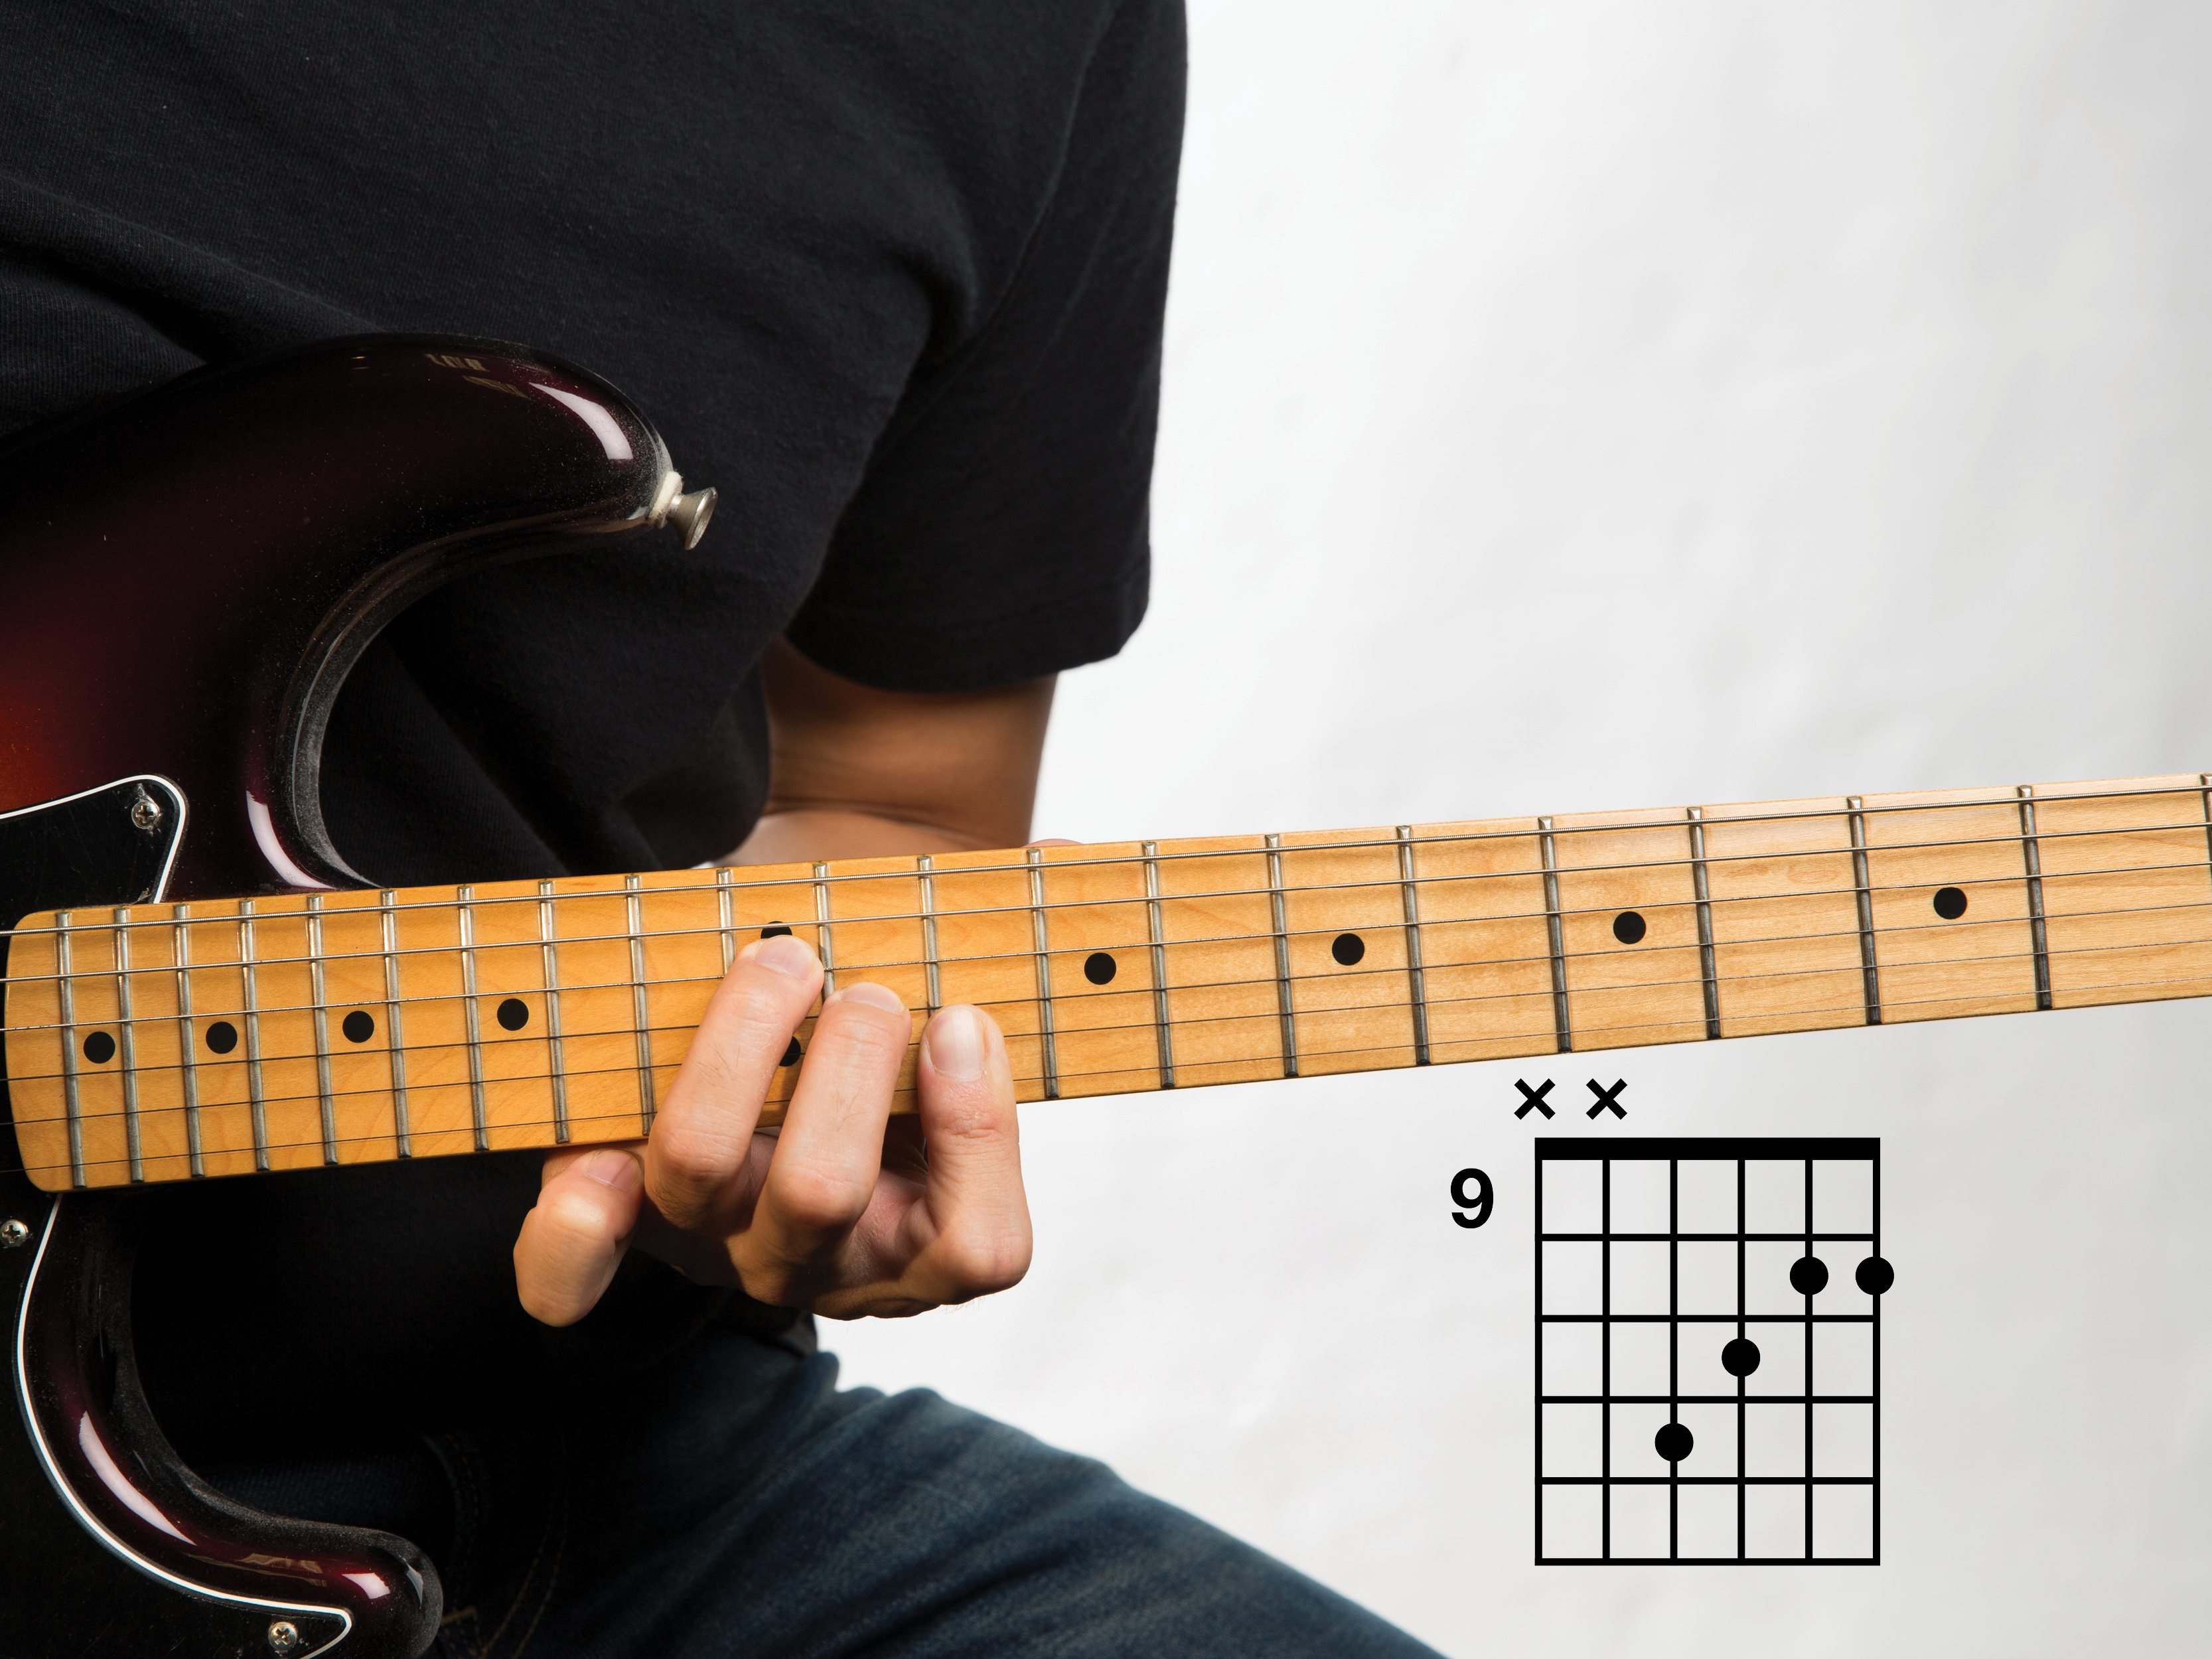 Beatles chord